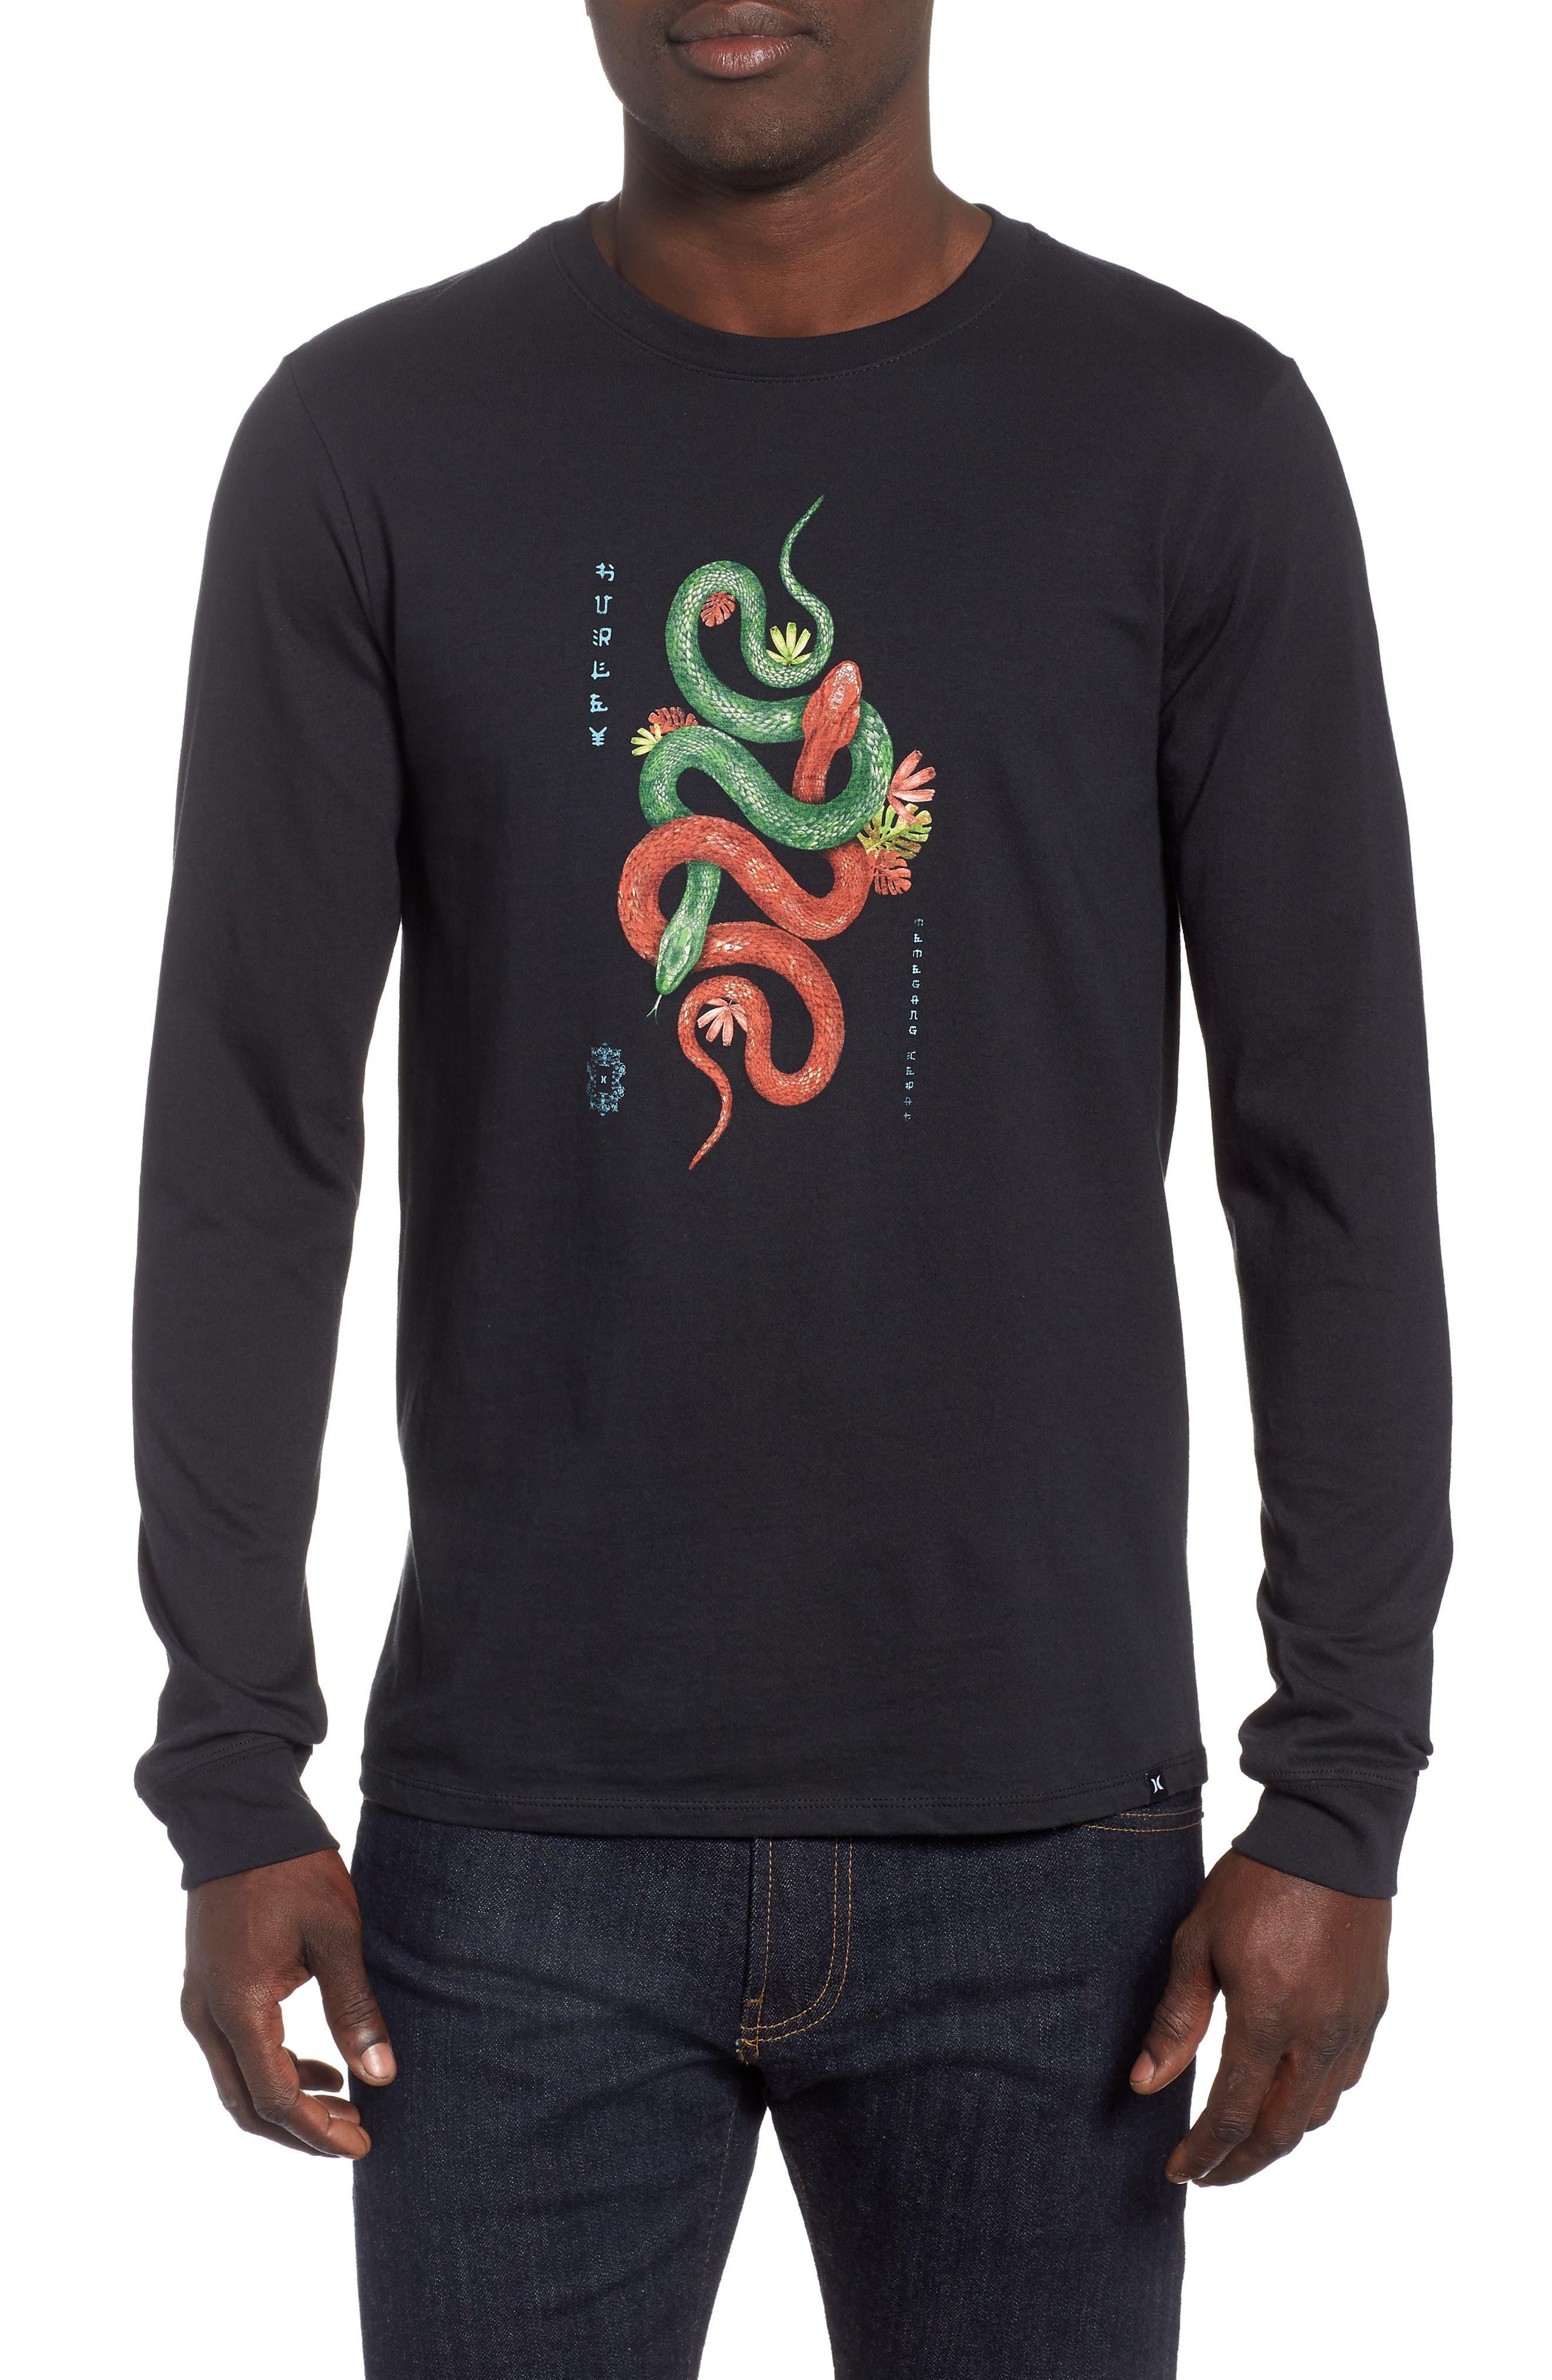 Tread Lightly Long Sleeve T-Shirt,                             Main thumbnail 1, color,                             BLACK